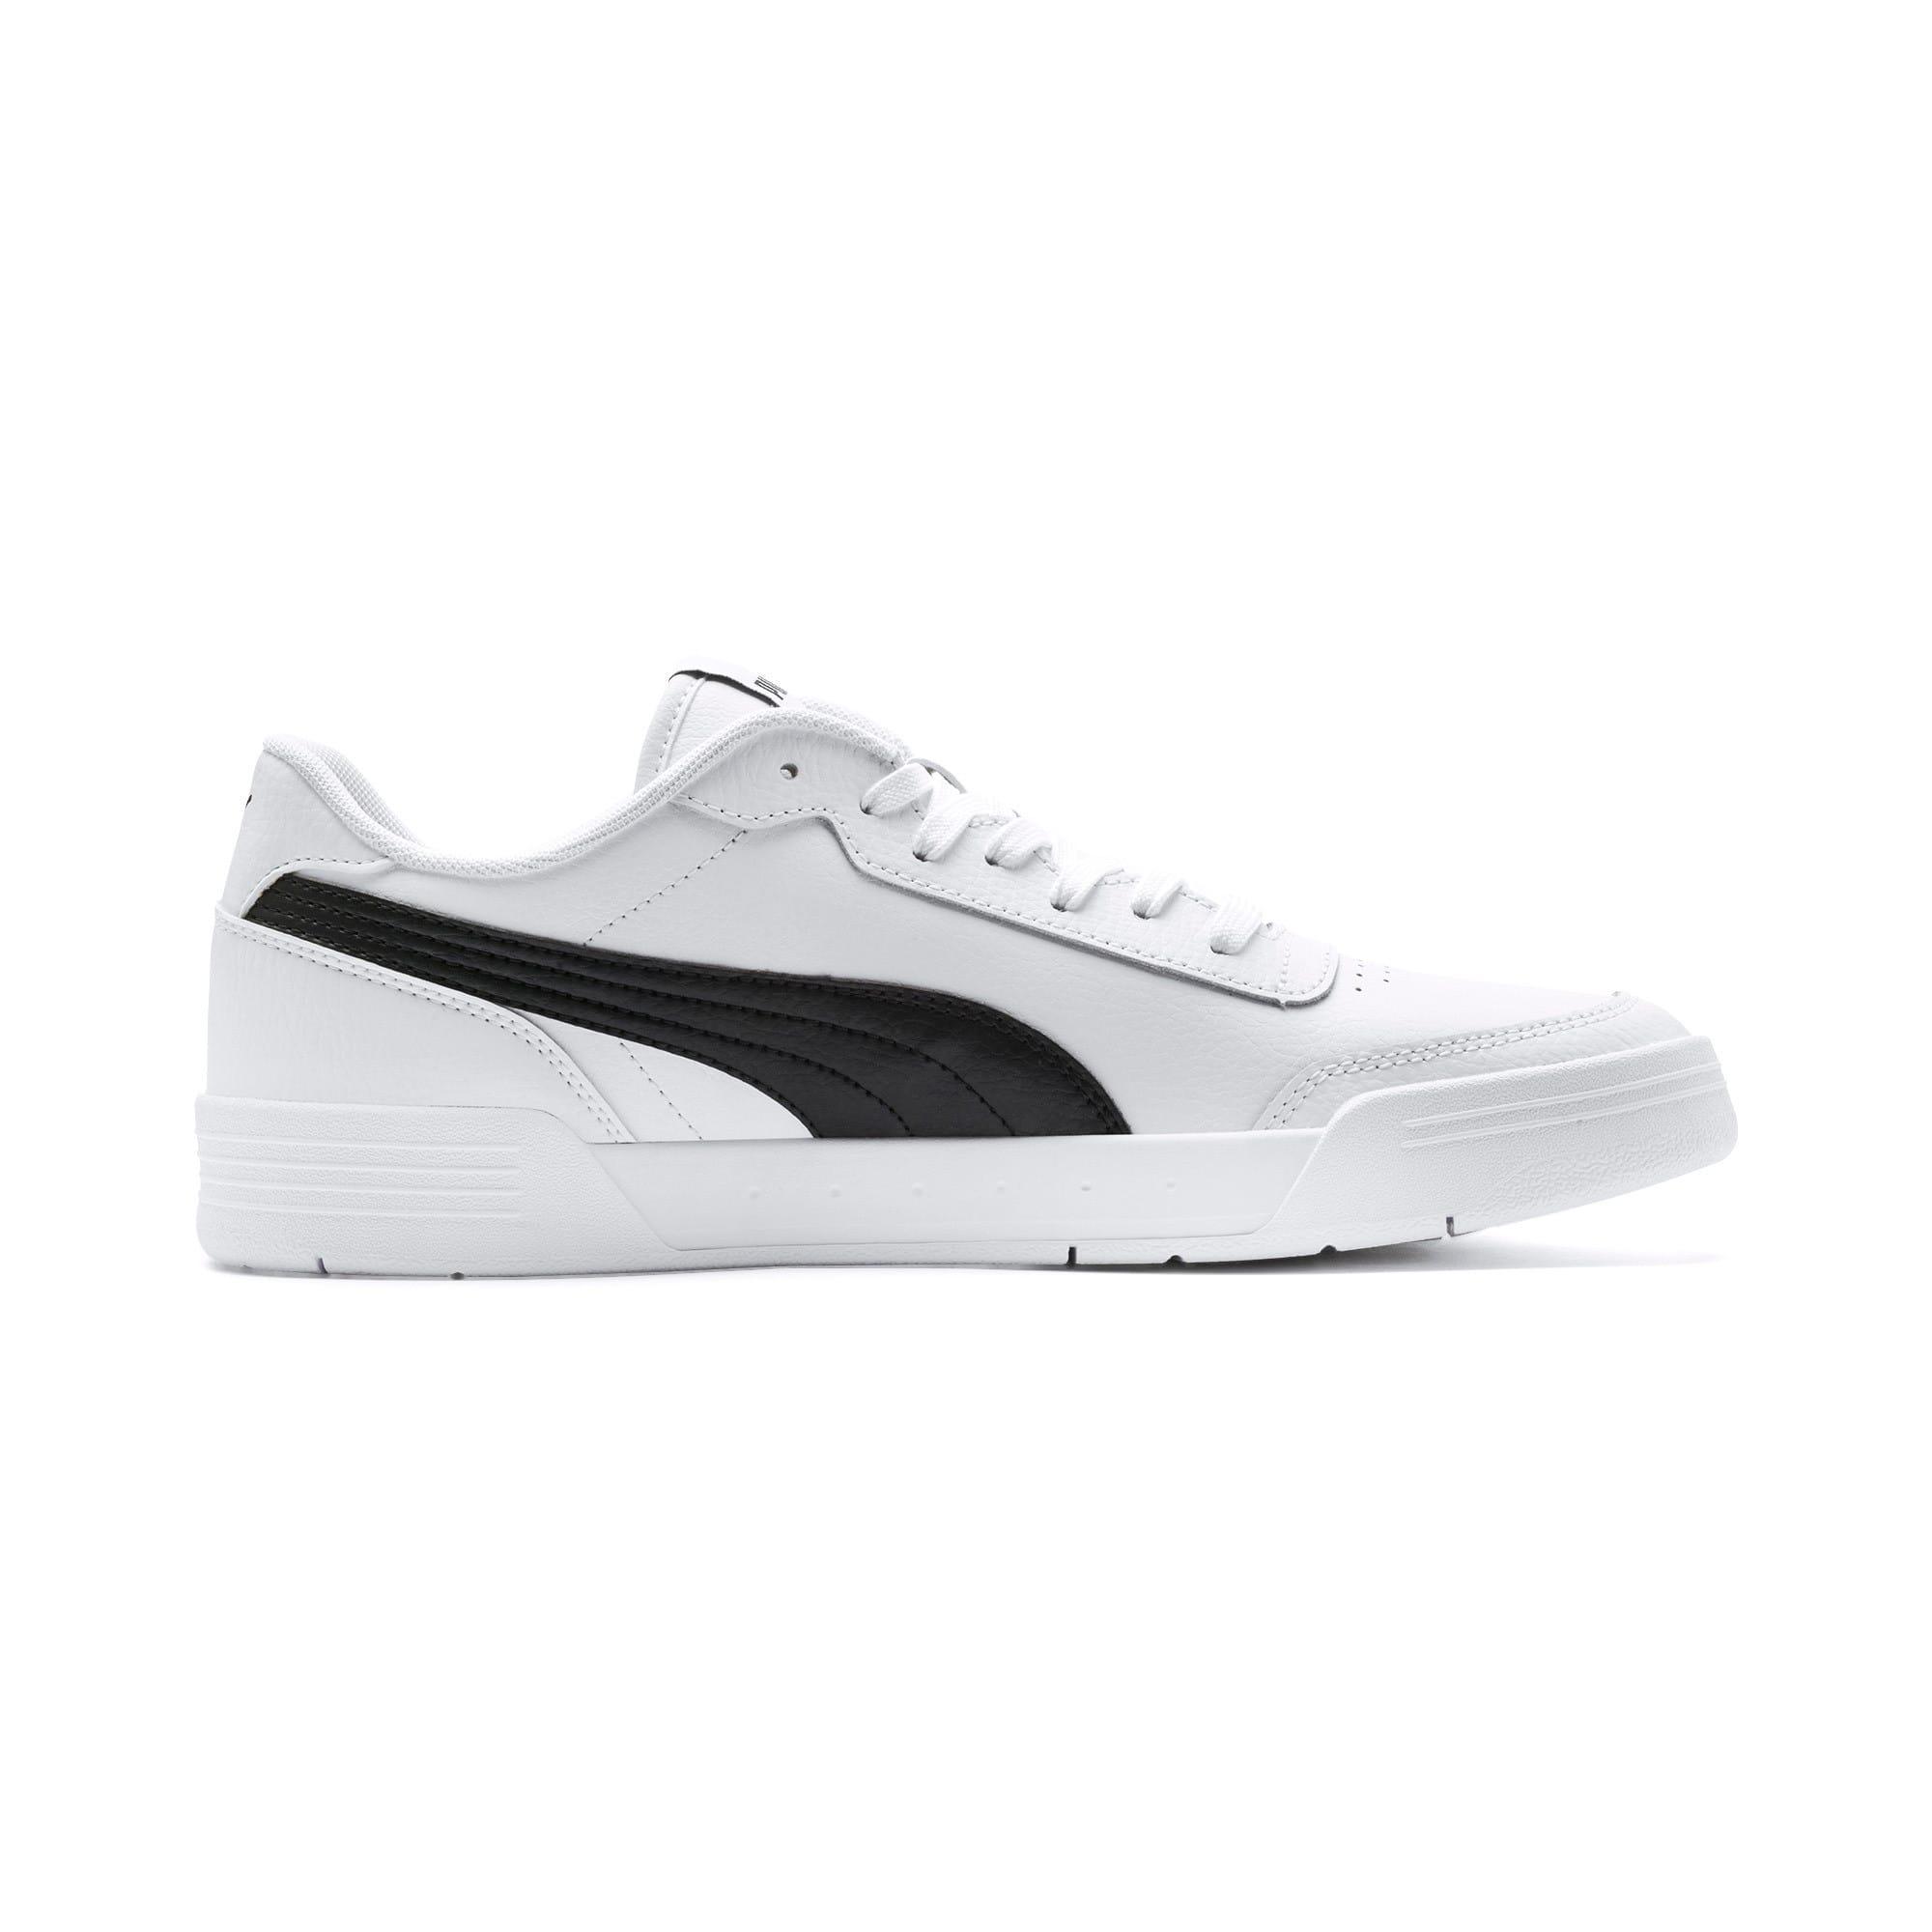 Thumbnail 6 of Caracal Sneakers, Puma White-Puma Black, medium